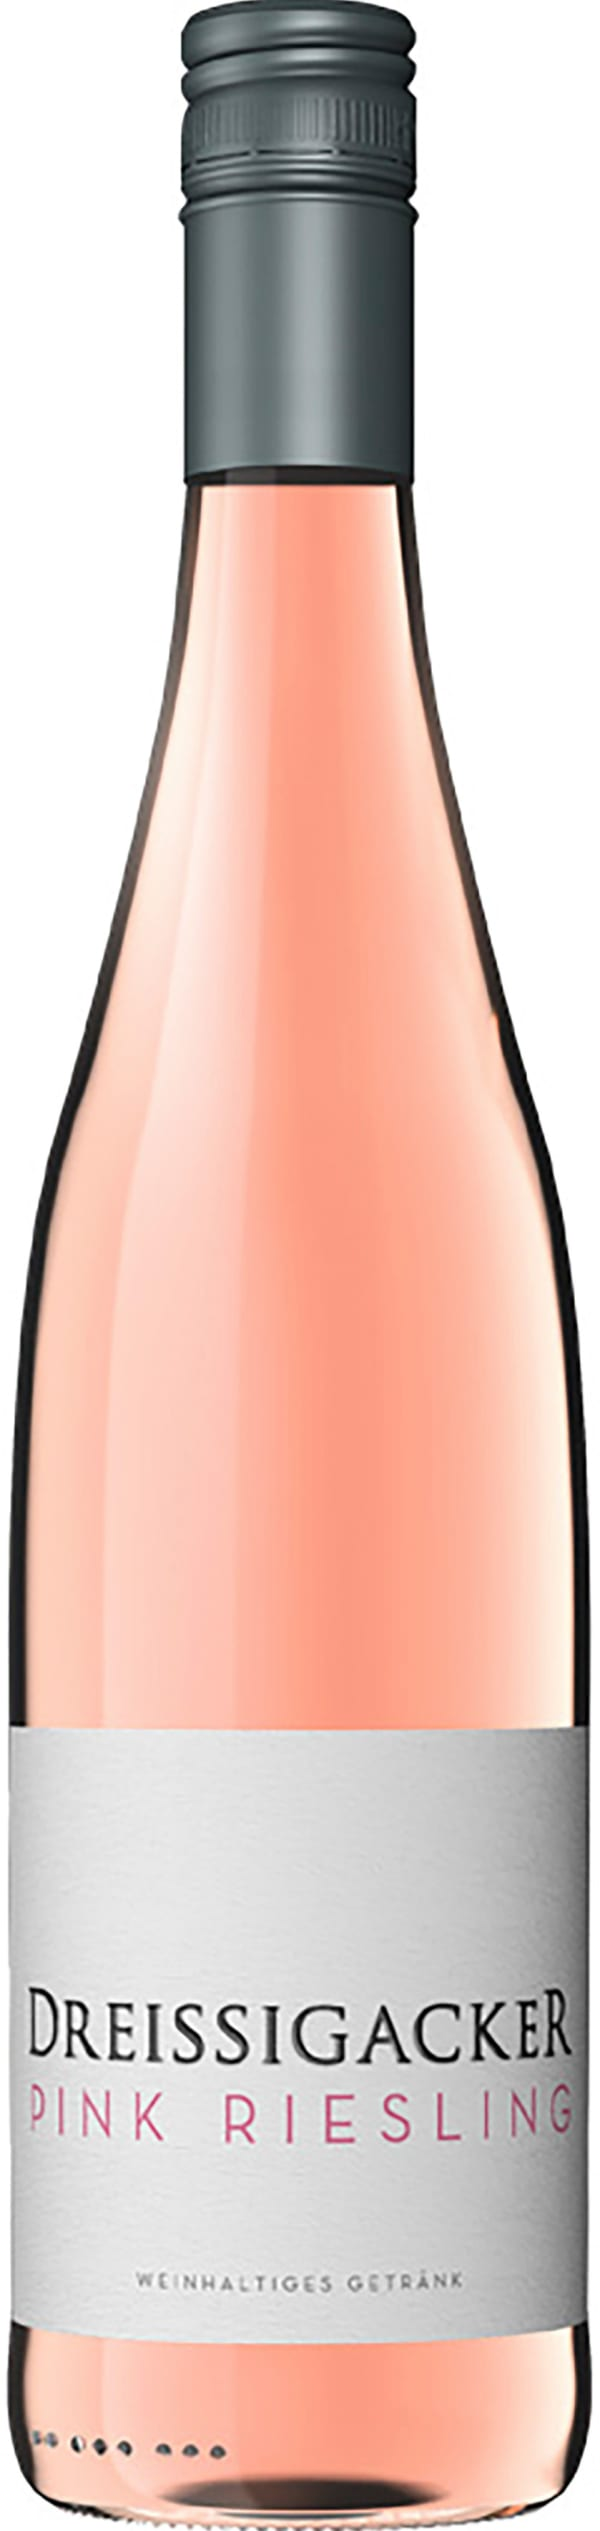 Dreissigacker Organic Pink Riesling